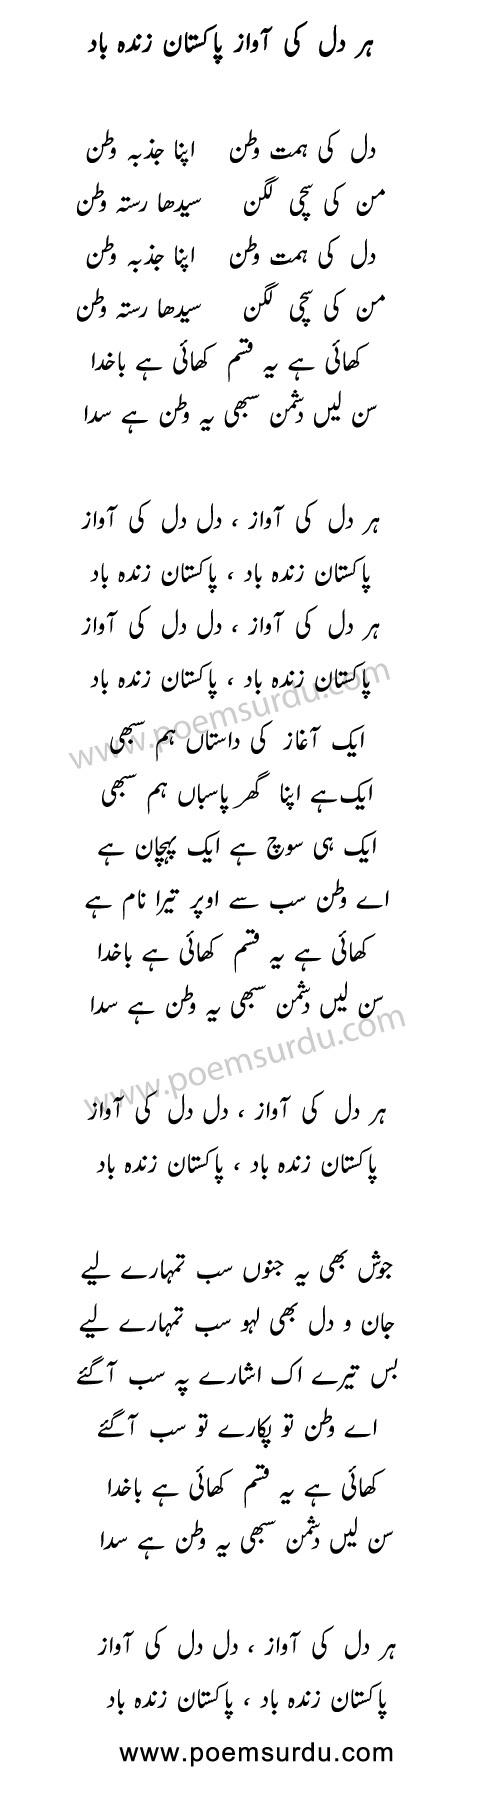 Har Dil Ki Awaz Pakistan Zindabad Lyrics